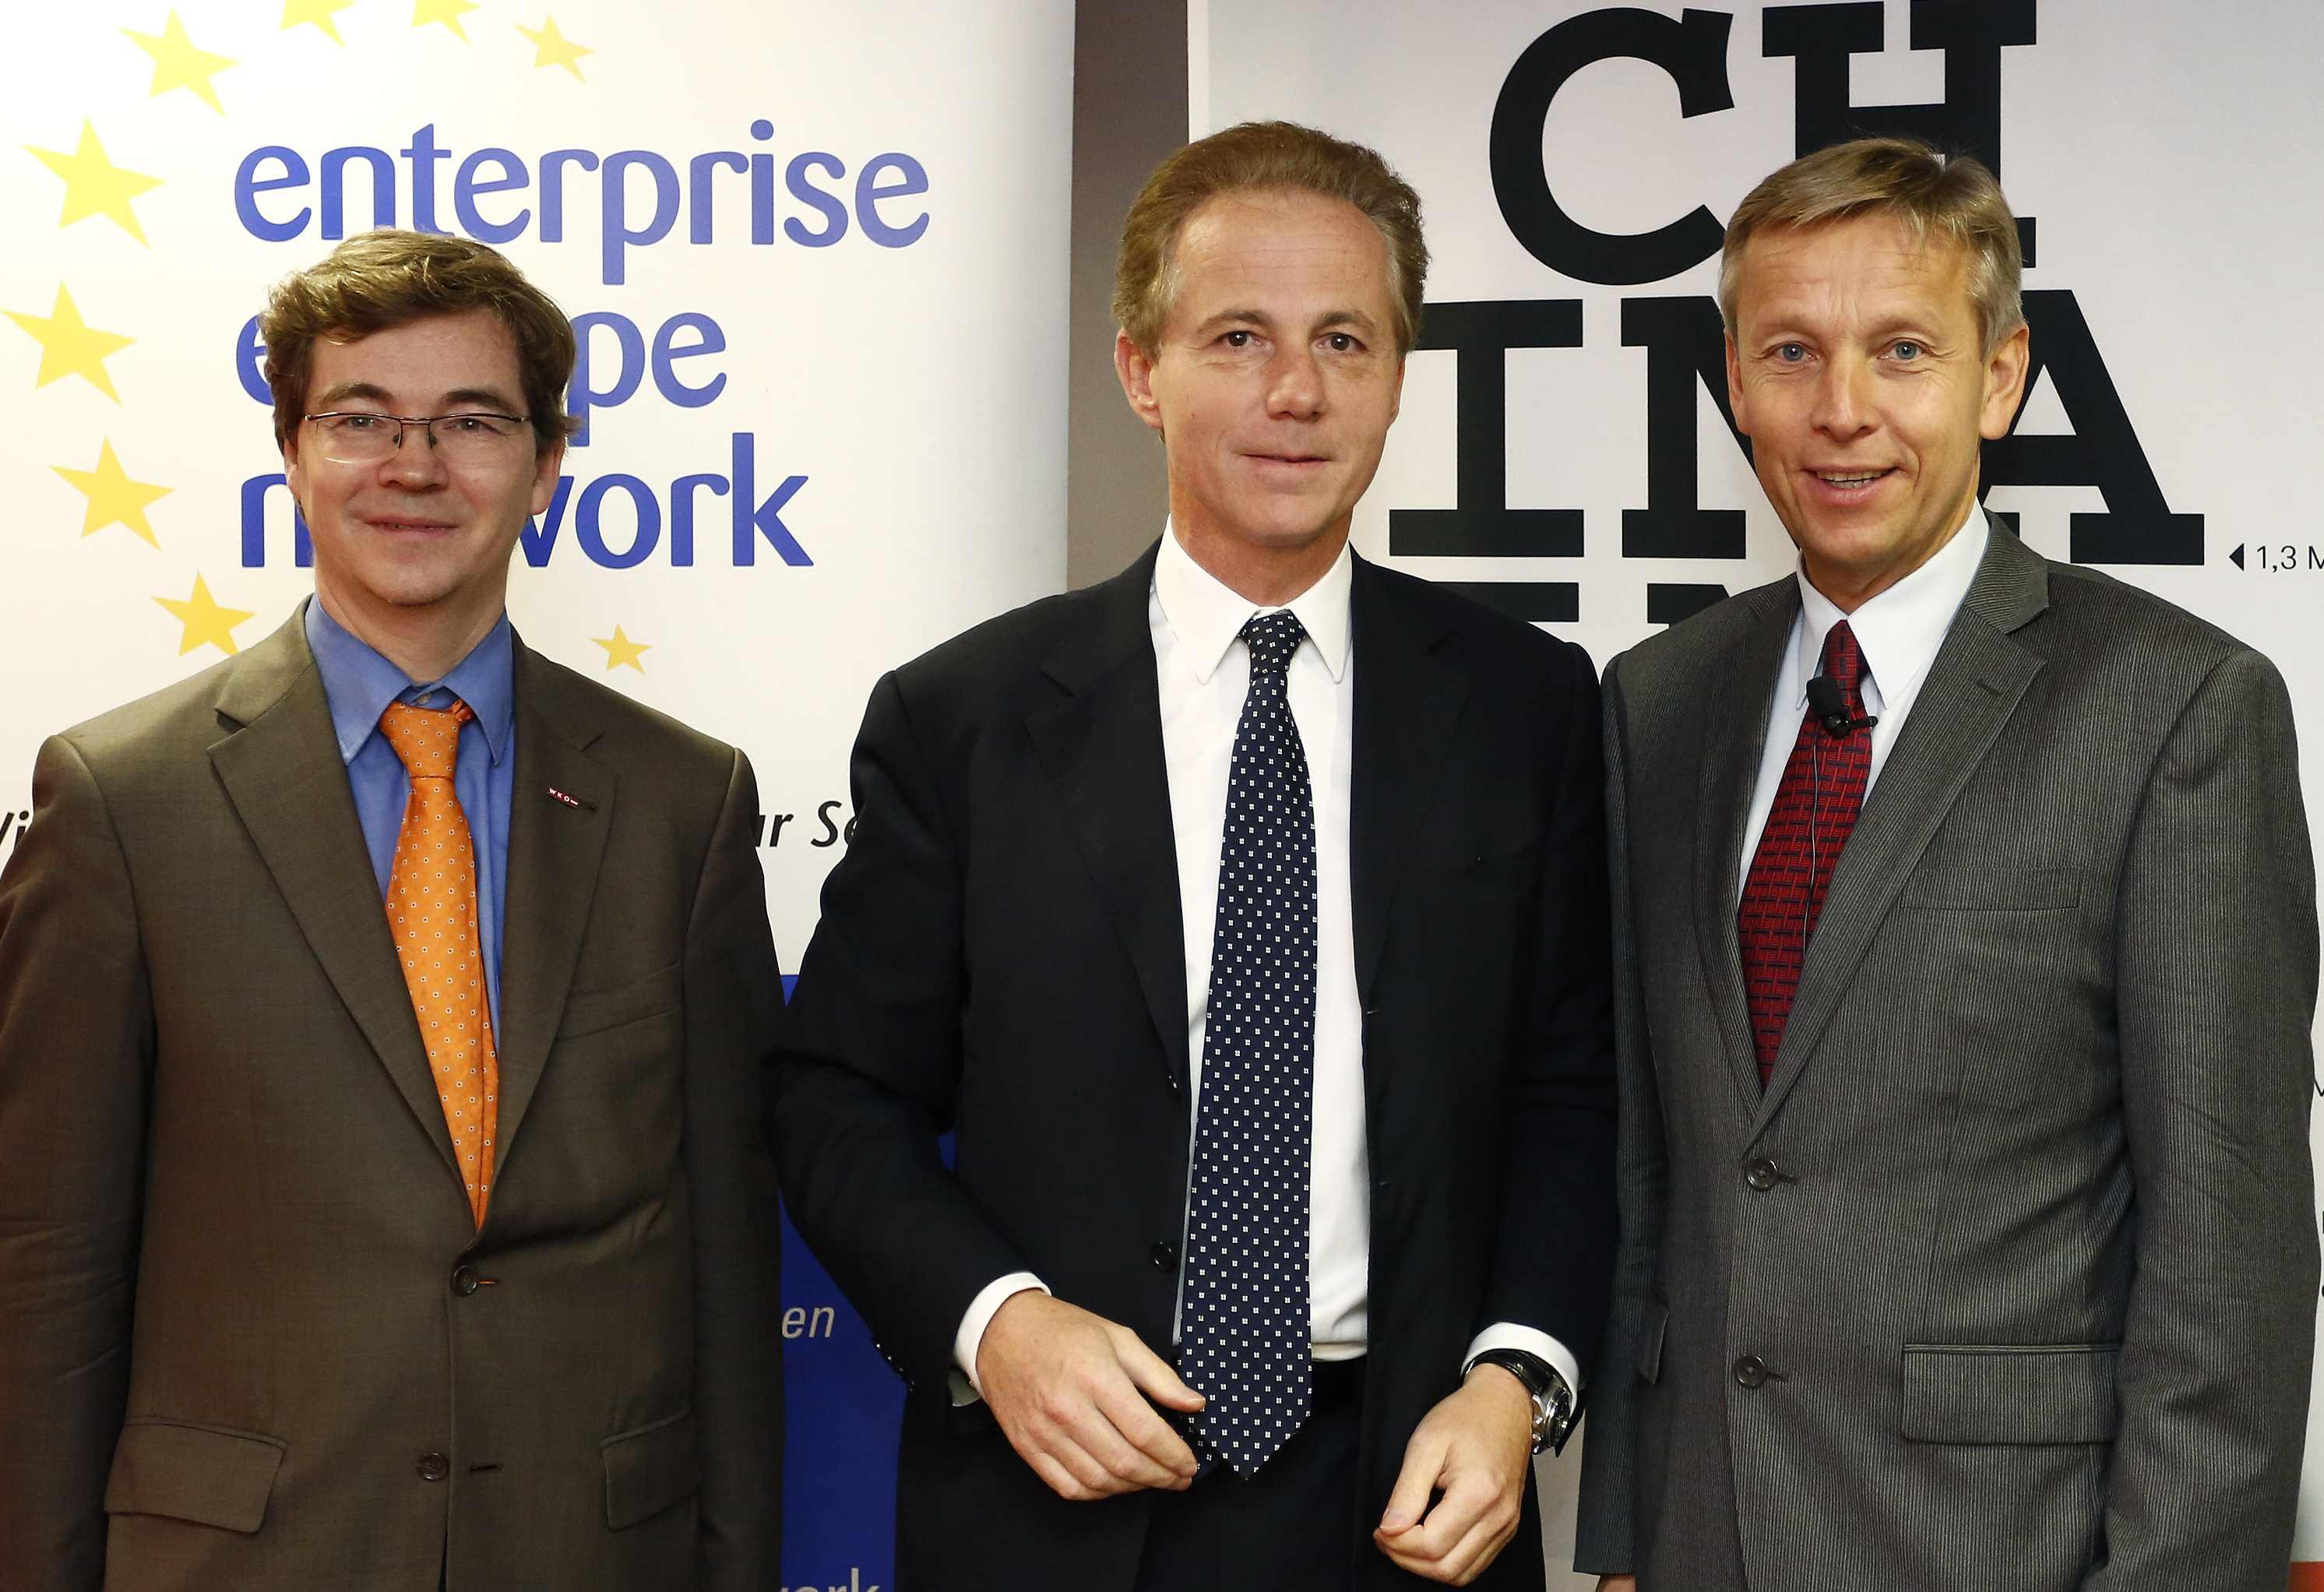 (c) BMEIA, Mag. Christian Mandl (WKÖ), Mag. Georg Kapsch (CEO Kapsch), STS Lopatka